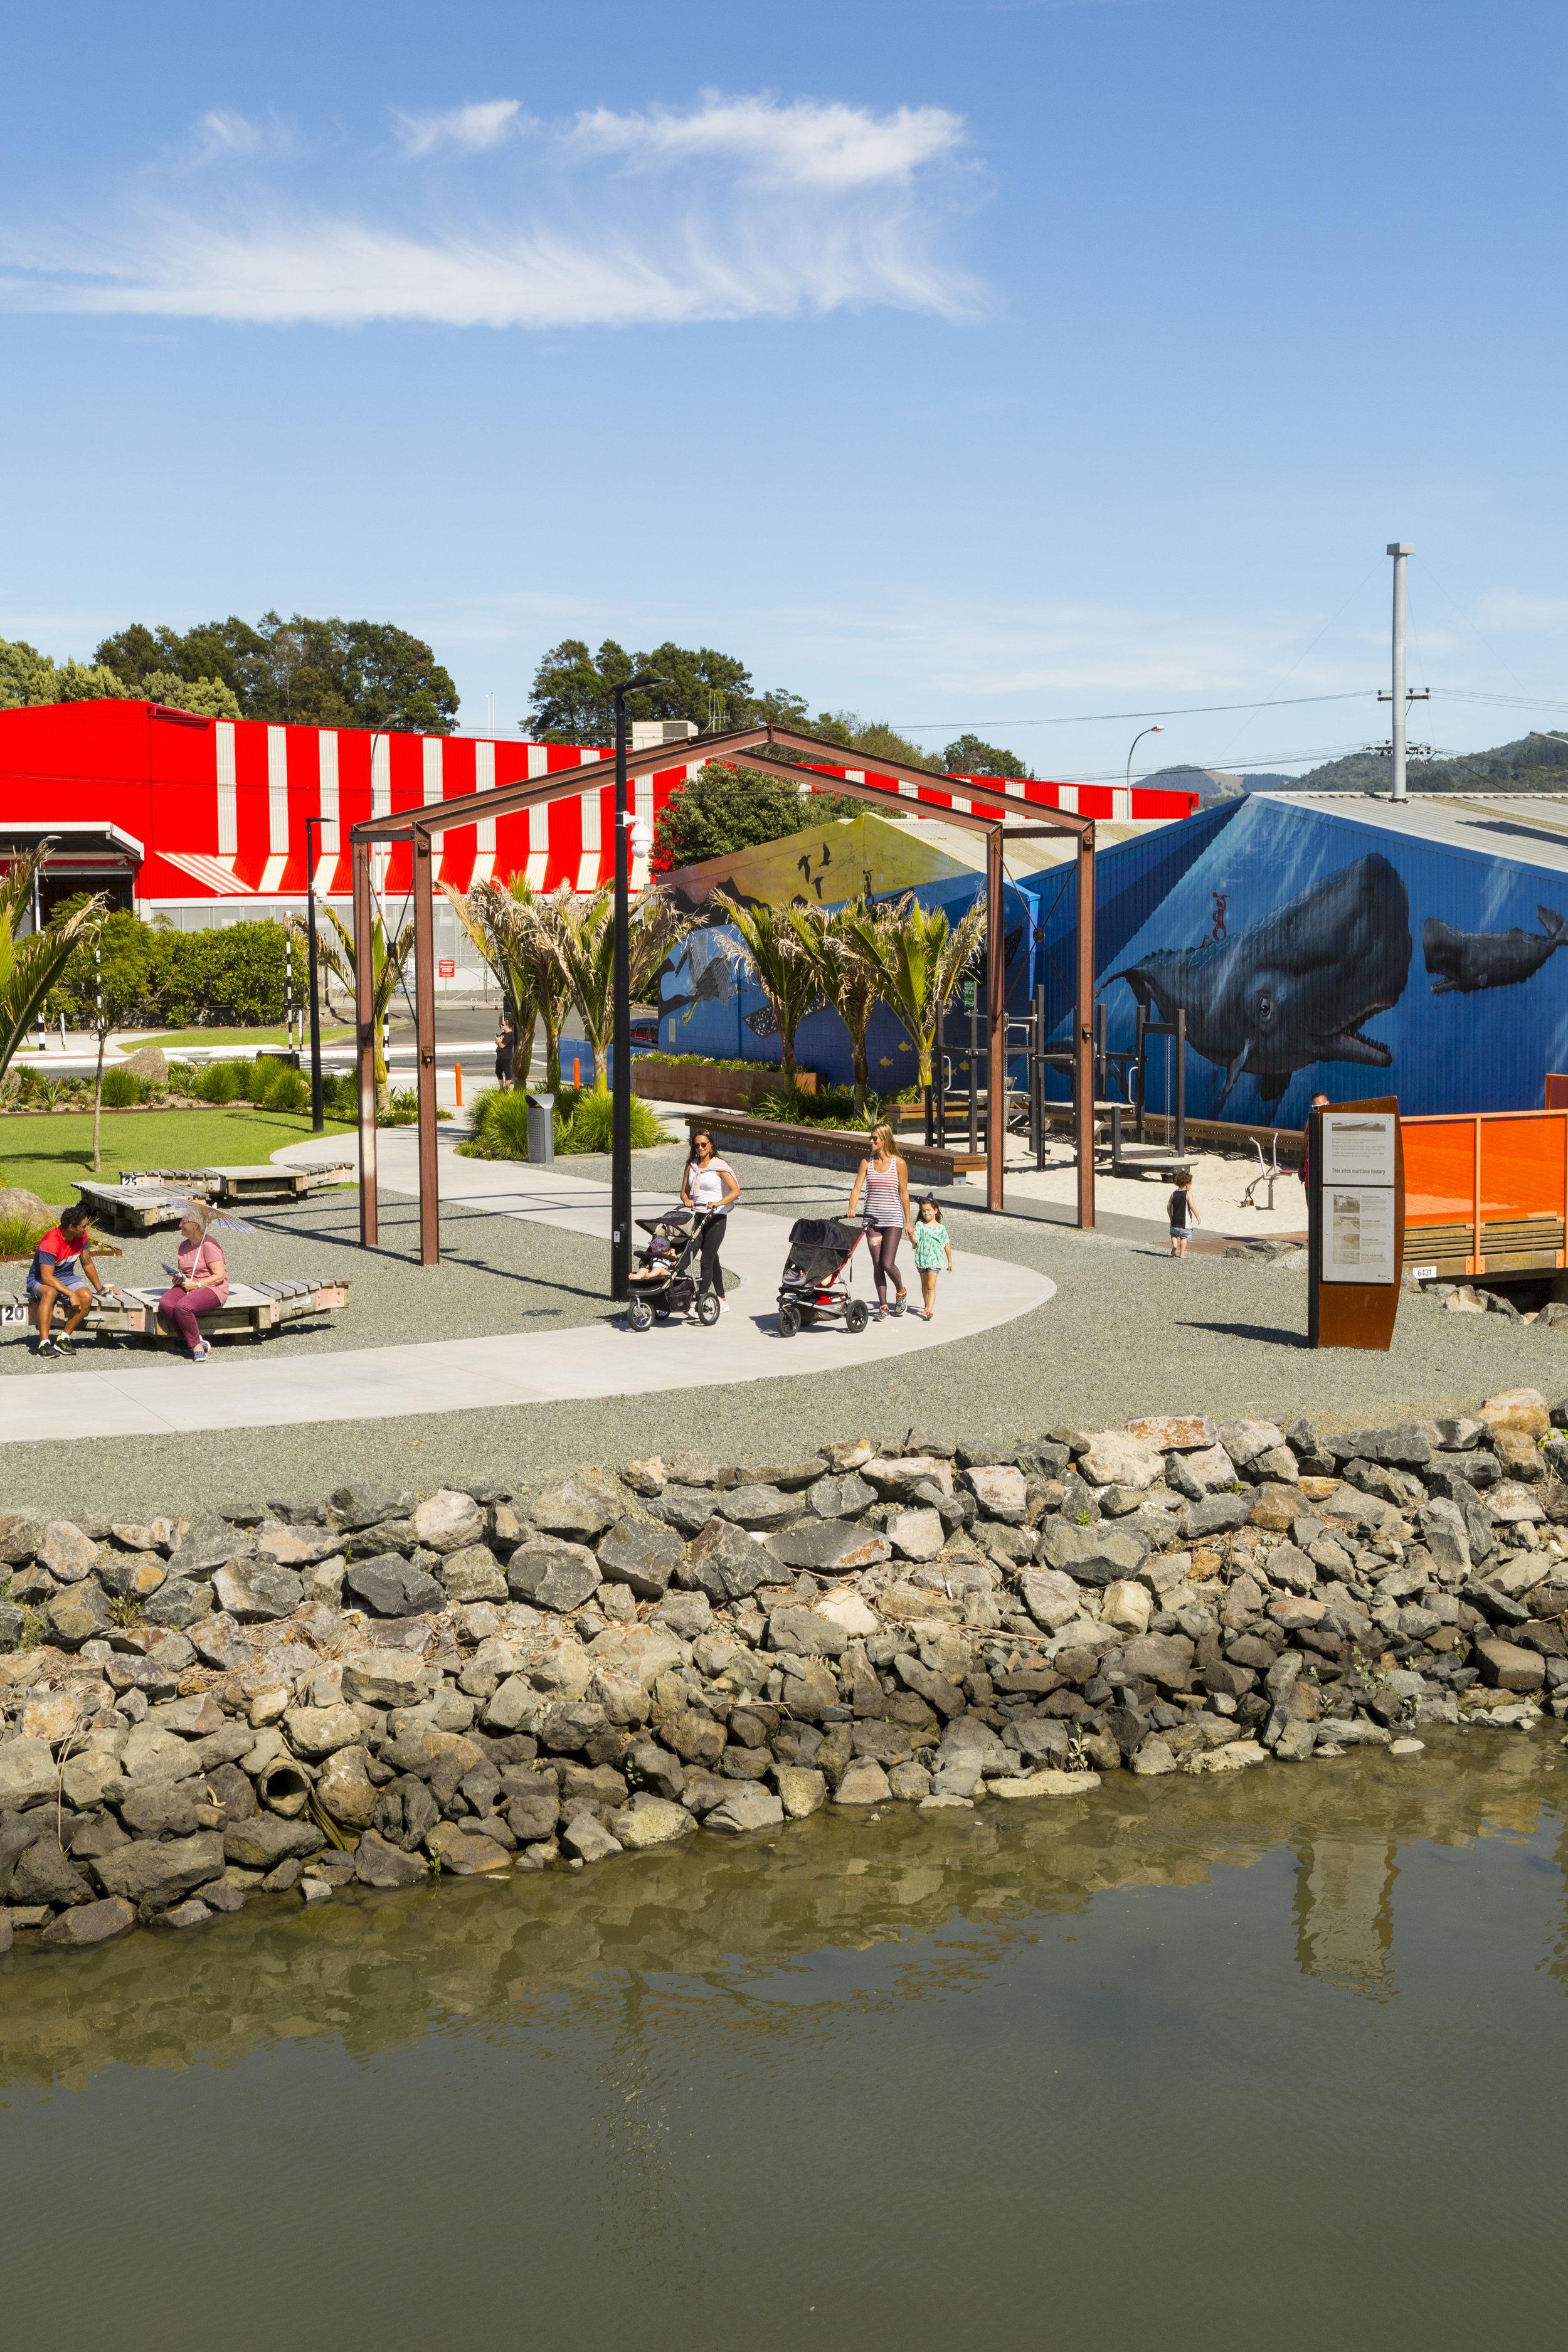 The park connects the Hatea Loop with Okara shopping precinct. Photo credit: Doug Pearson